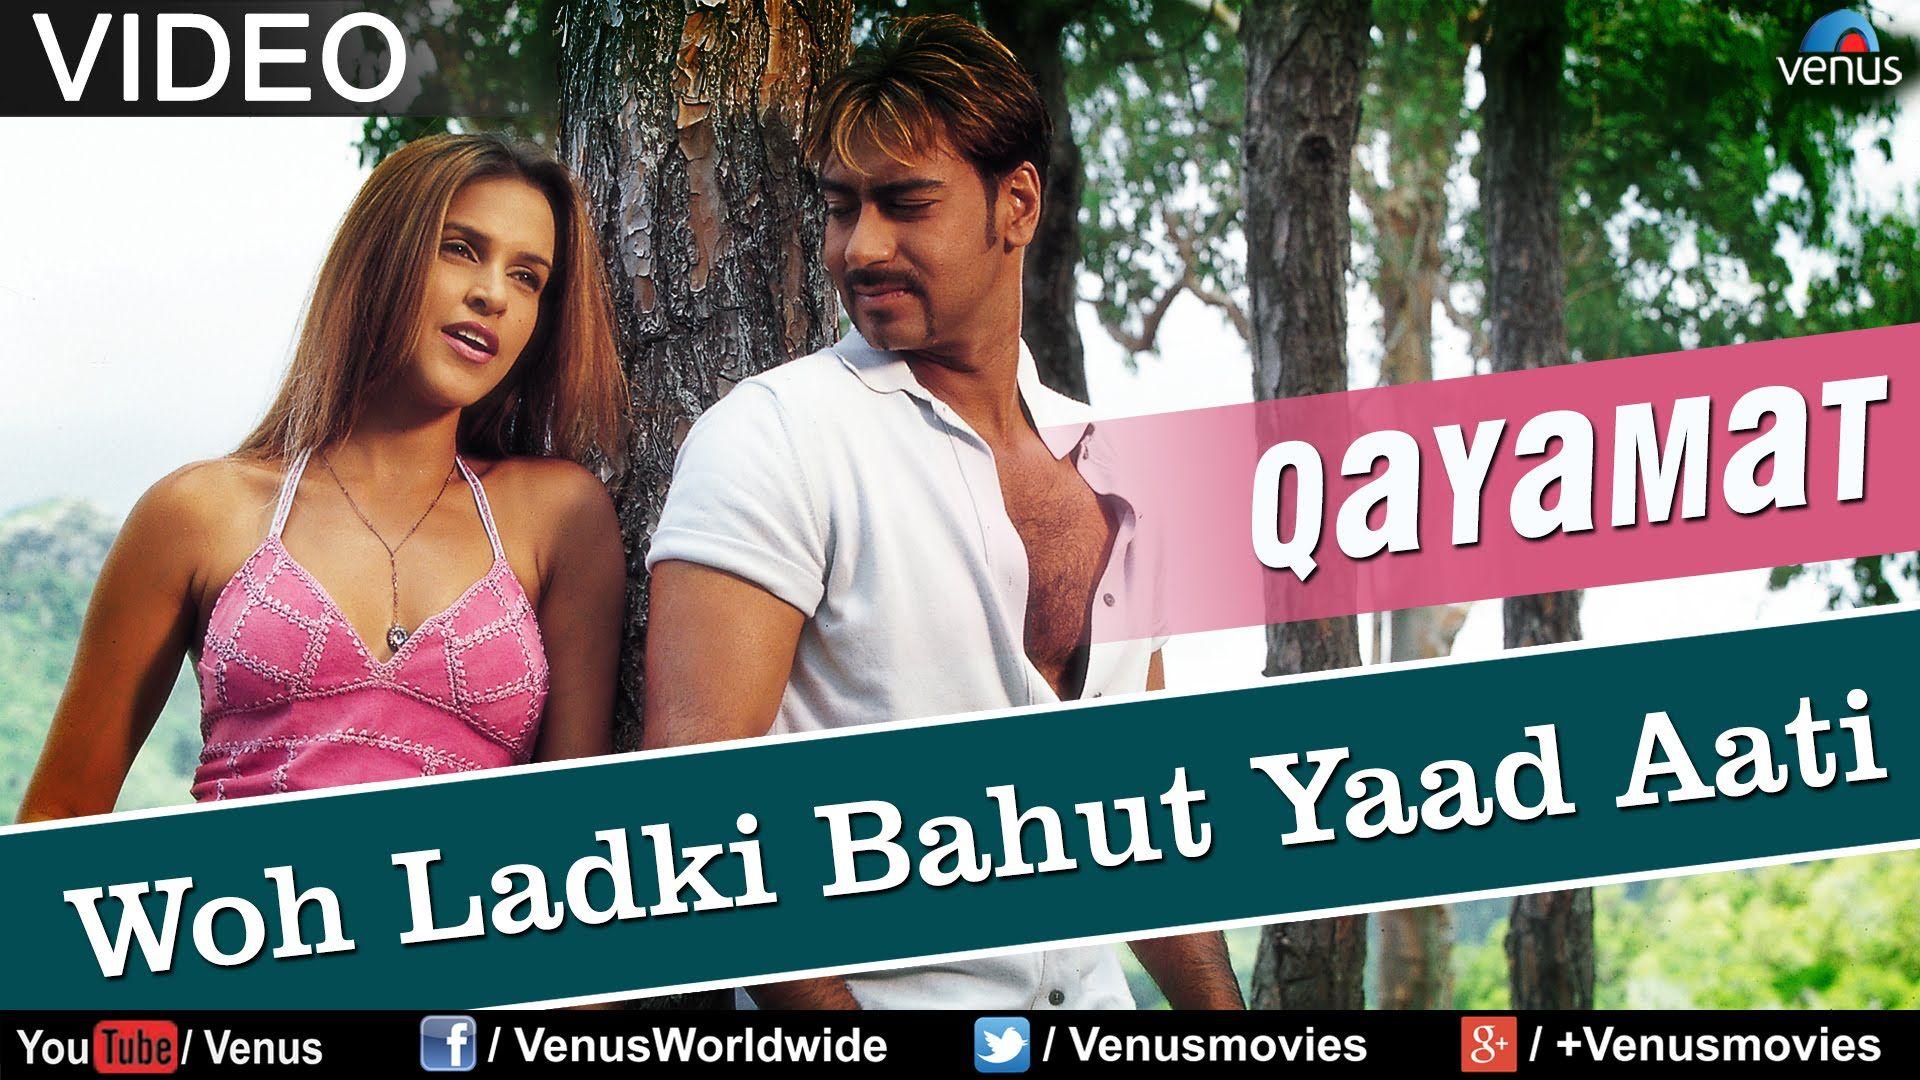 Woh Ladki Bahut Yaad Aati Qayamat Lata Mangeshkar Songs Songs Latest Bollywood Songs